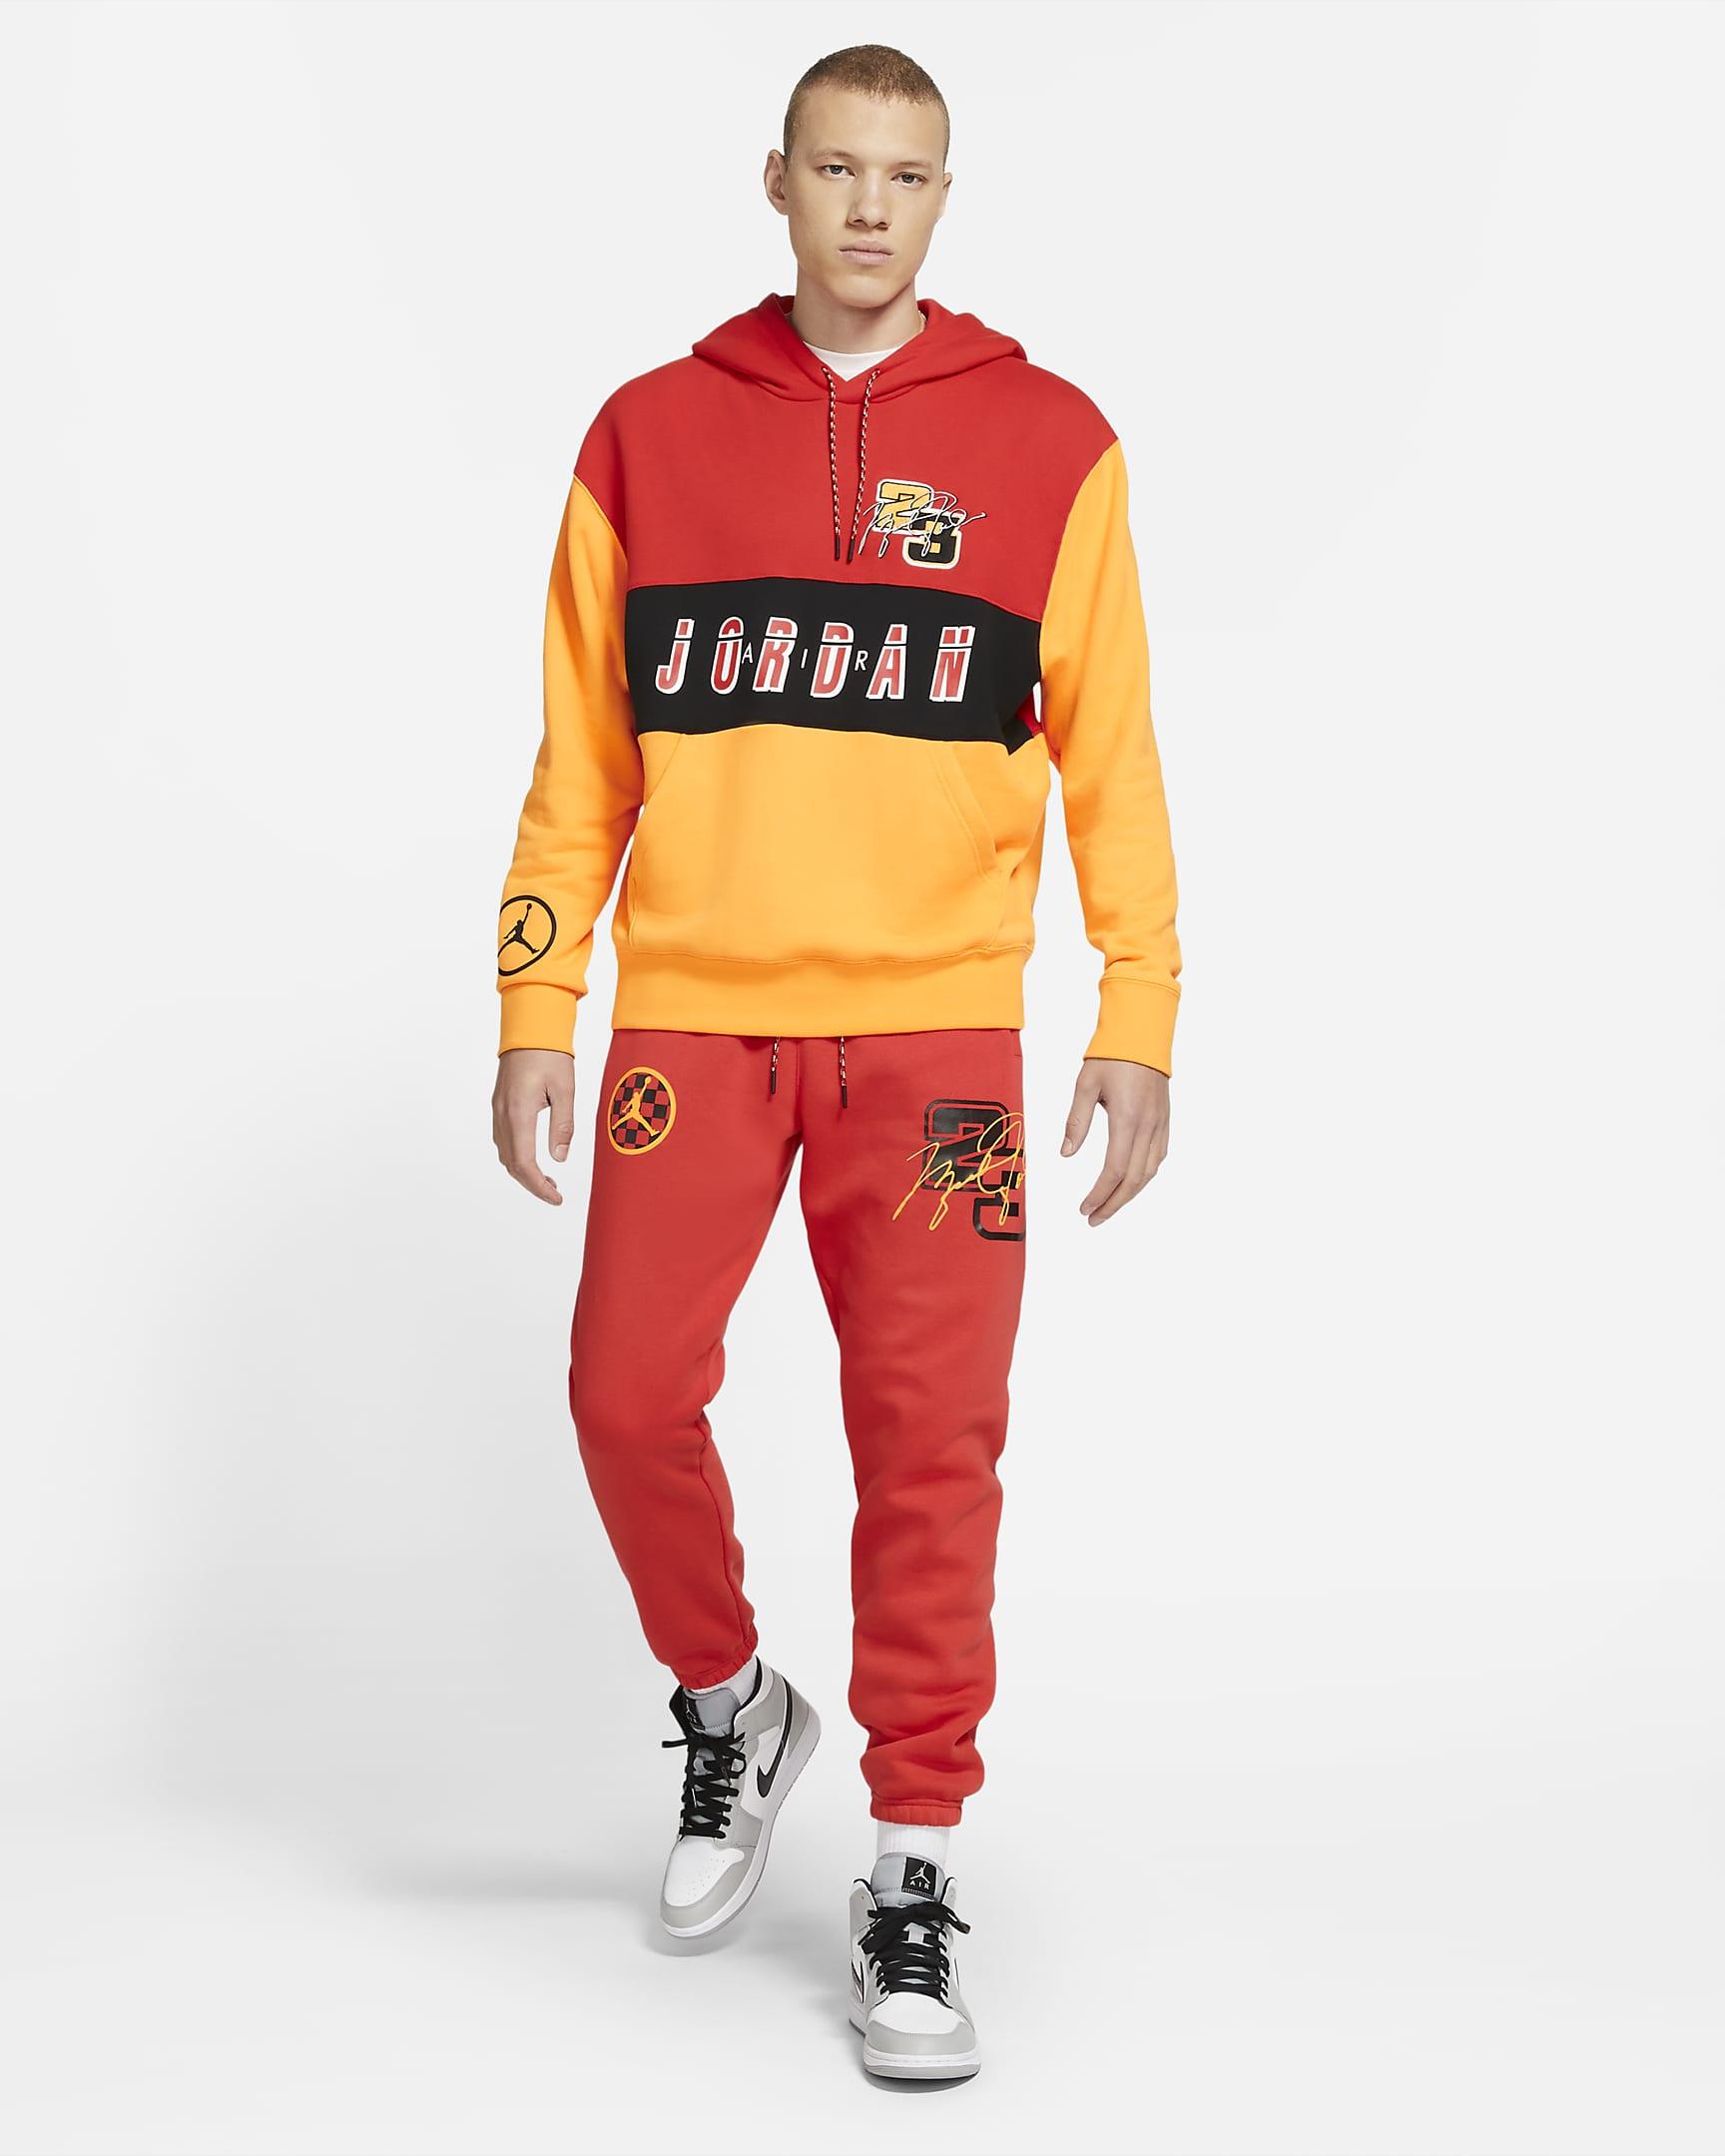 jordan-sport-dna-mens-pullover-hoodie-rMj8Rw-7